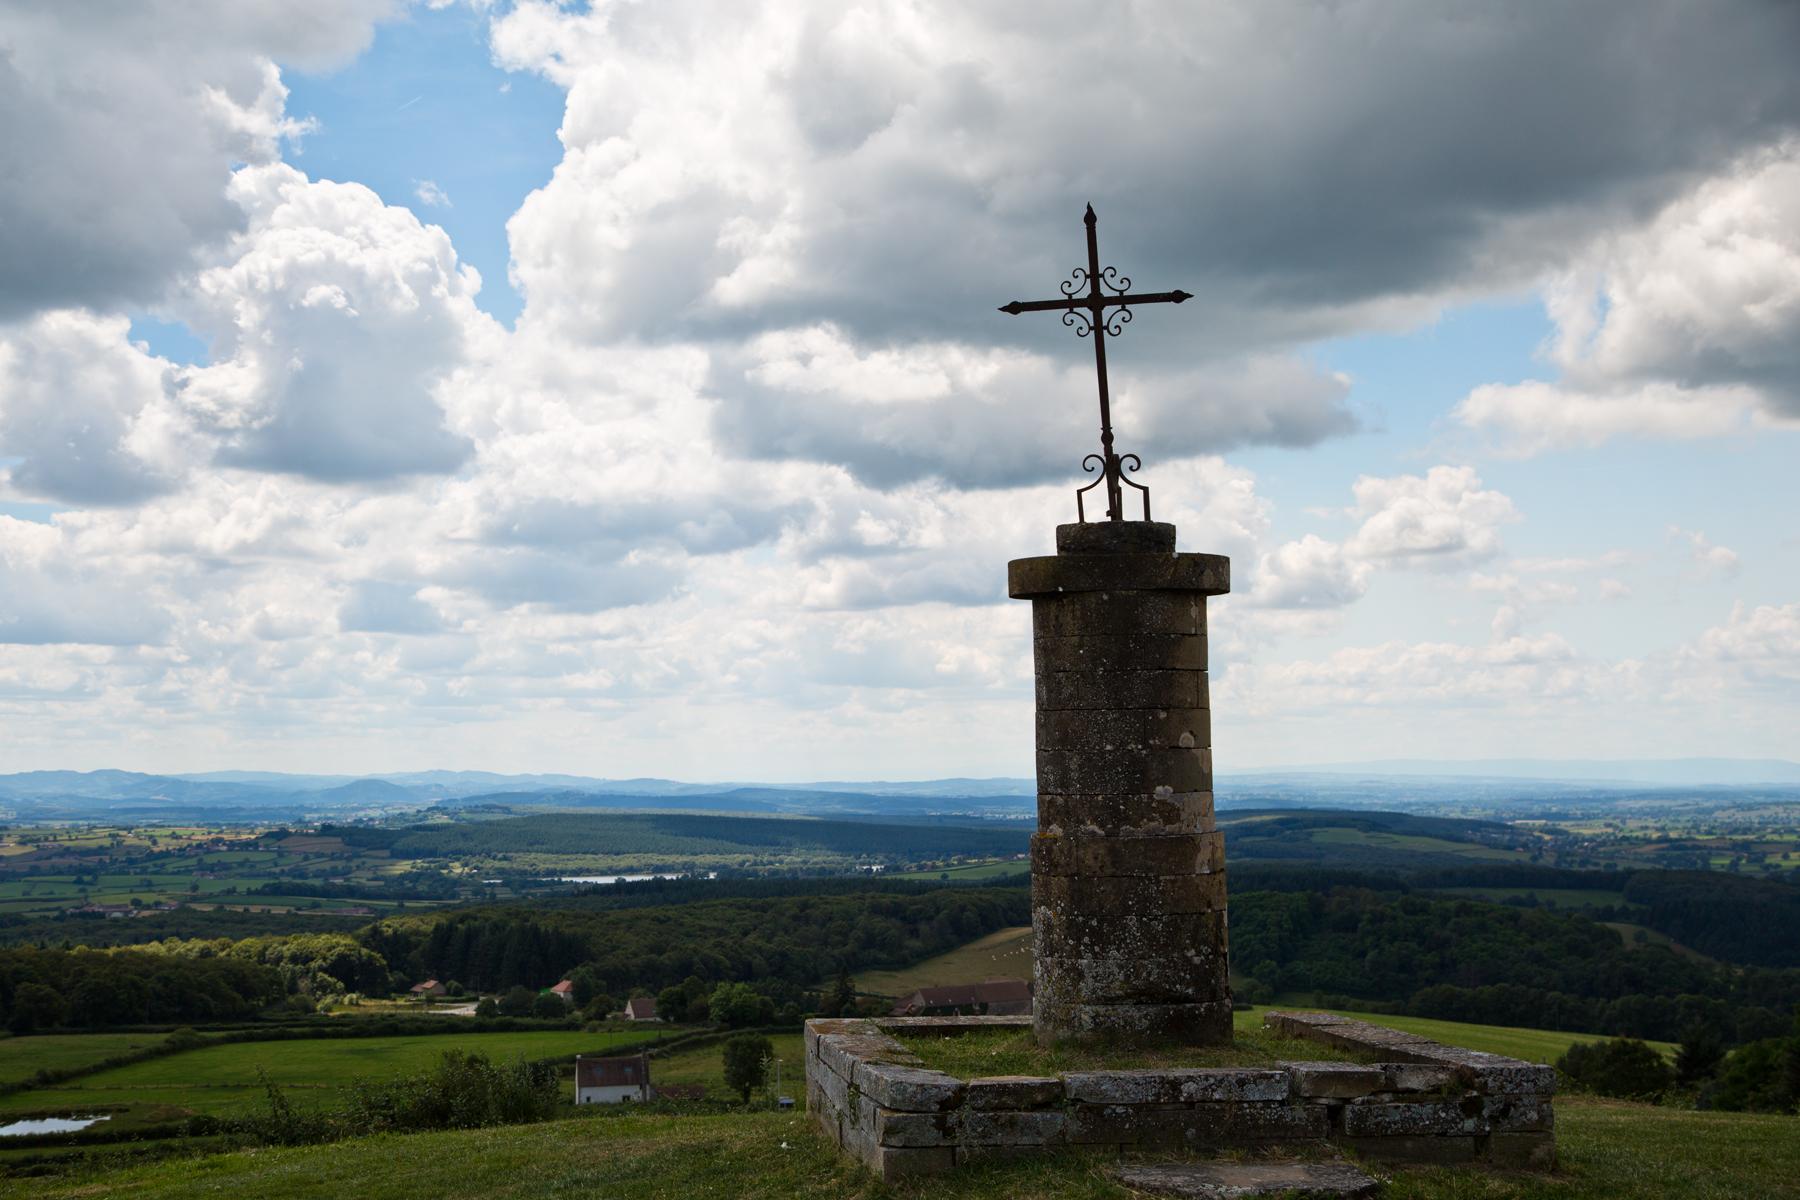 Aussichtspunkt Mont Saint Vincent